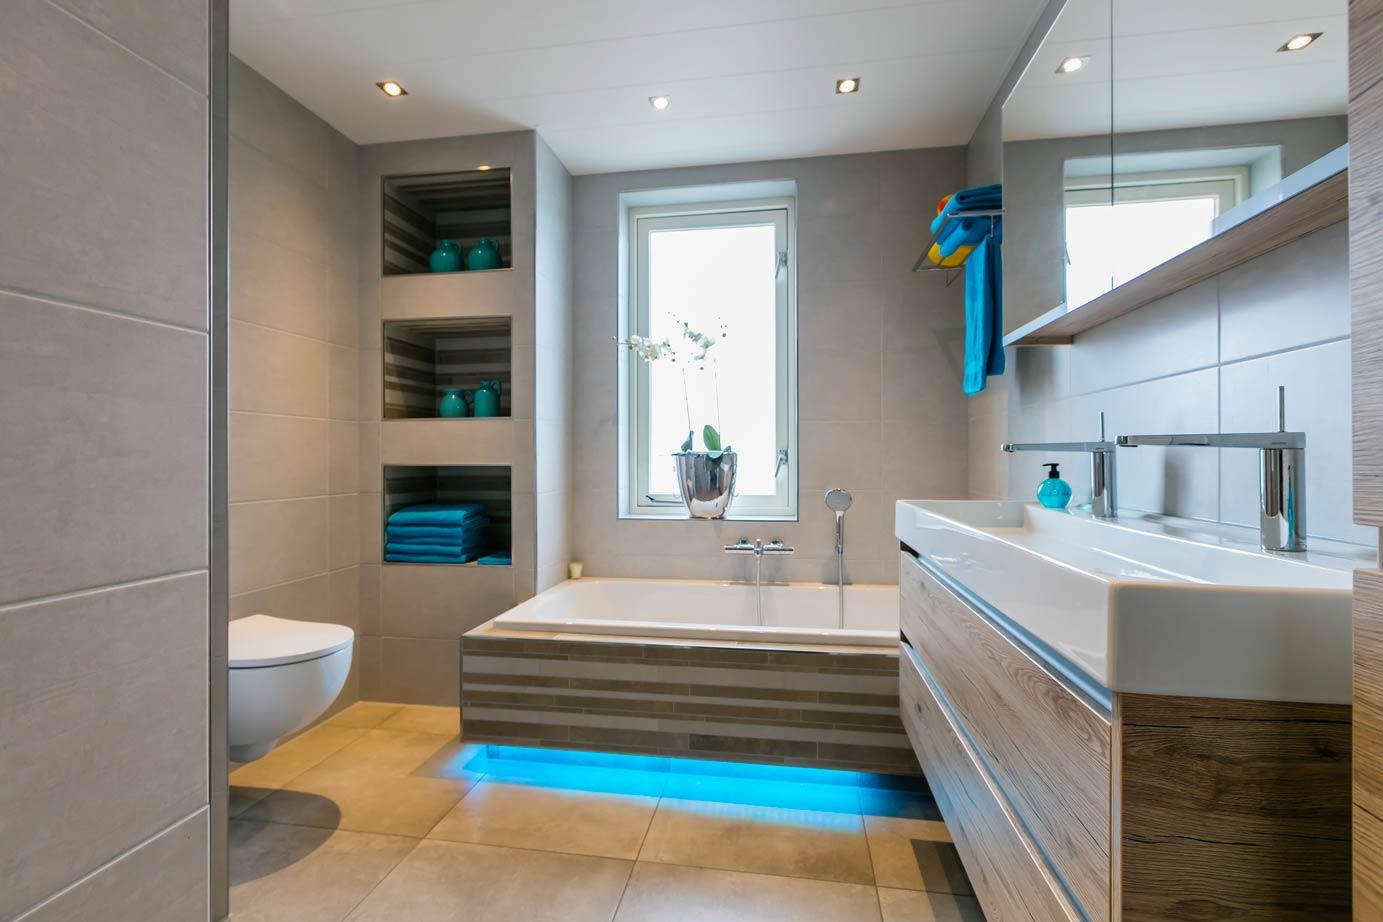 Tegels Badkamer Lelystad : Badkamer kopen in ermelo lees klantervaring arma